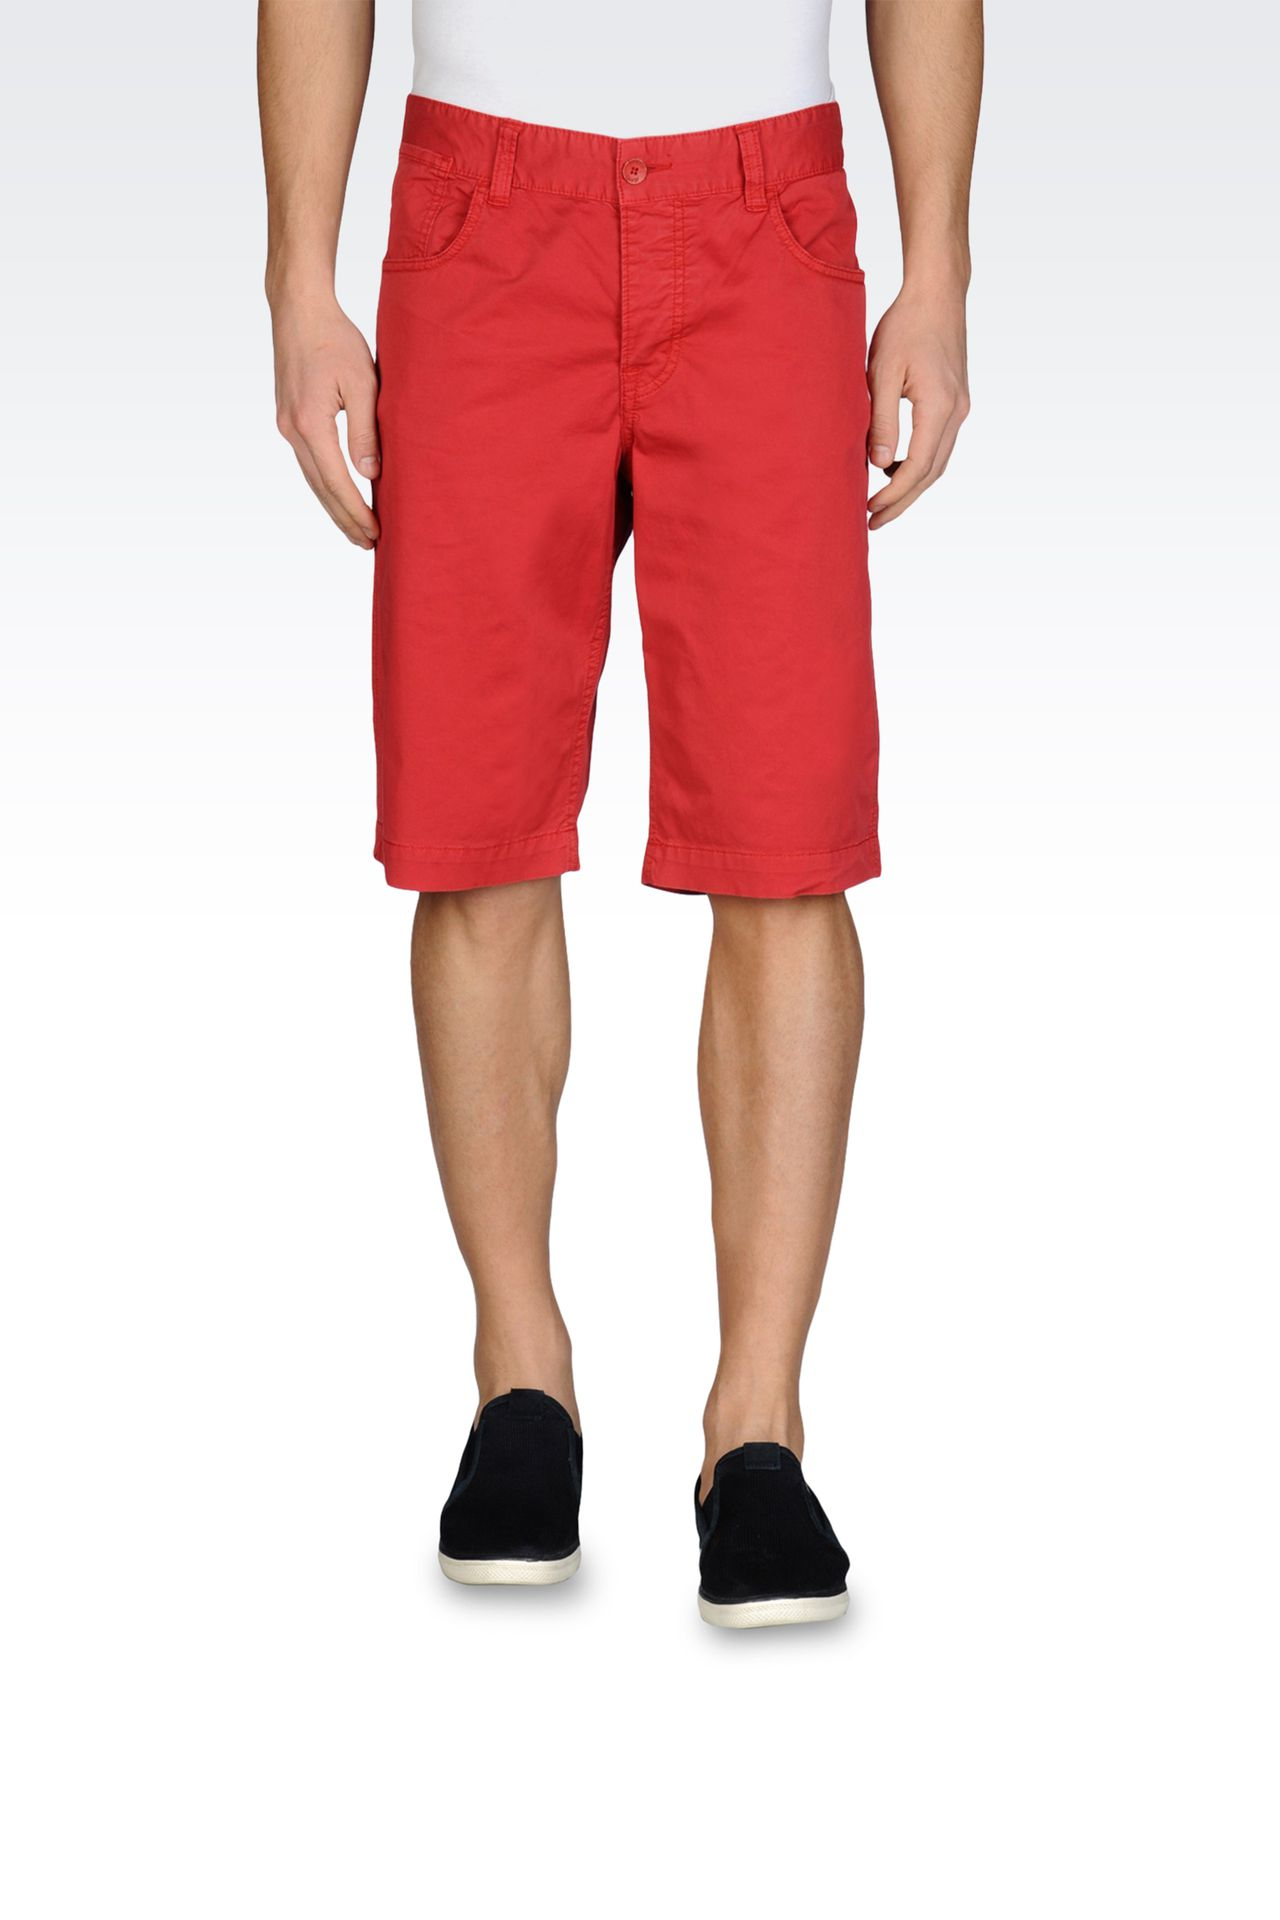 BERMUDA SHORTS IN PIGMENT DYED STRETCH GABARDINE: Bermuda shorts Men by Armani - 0